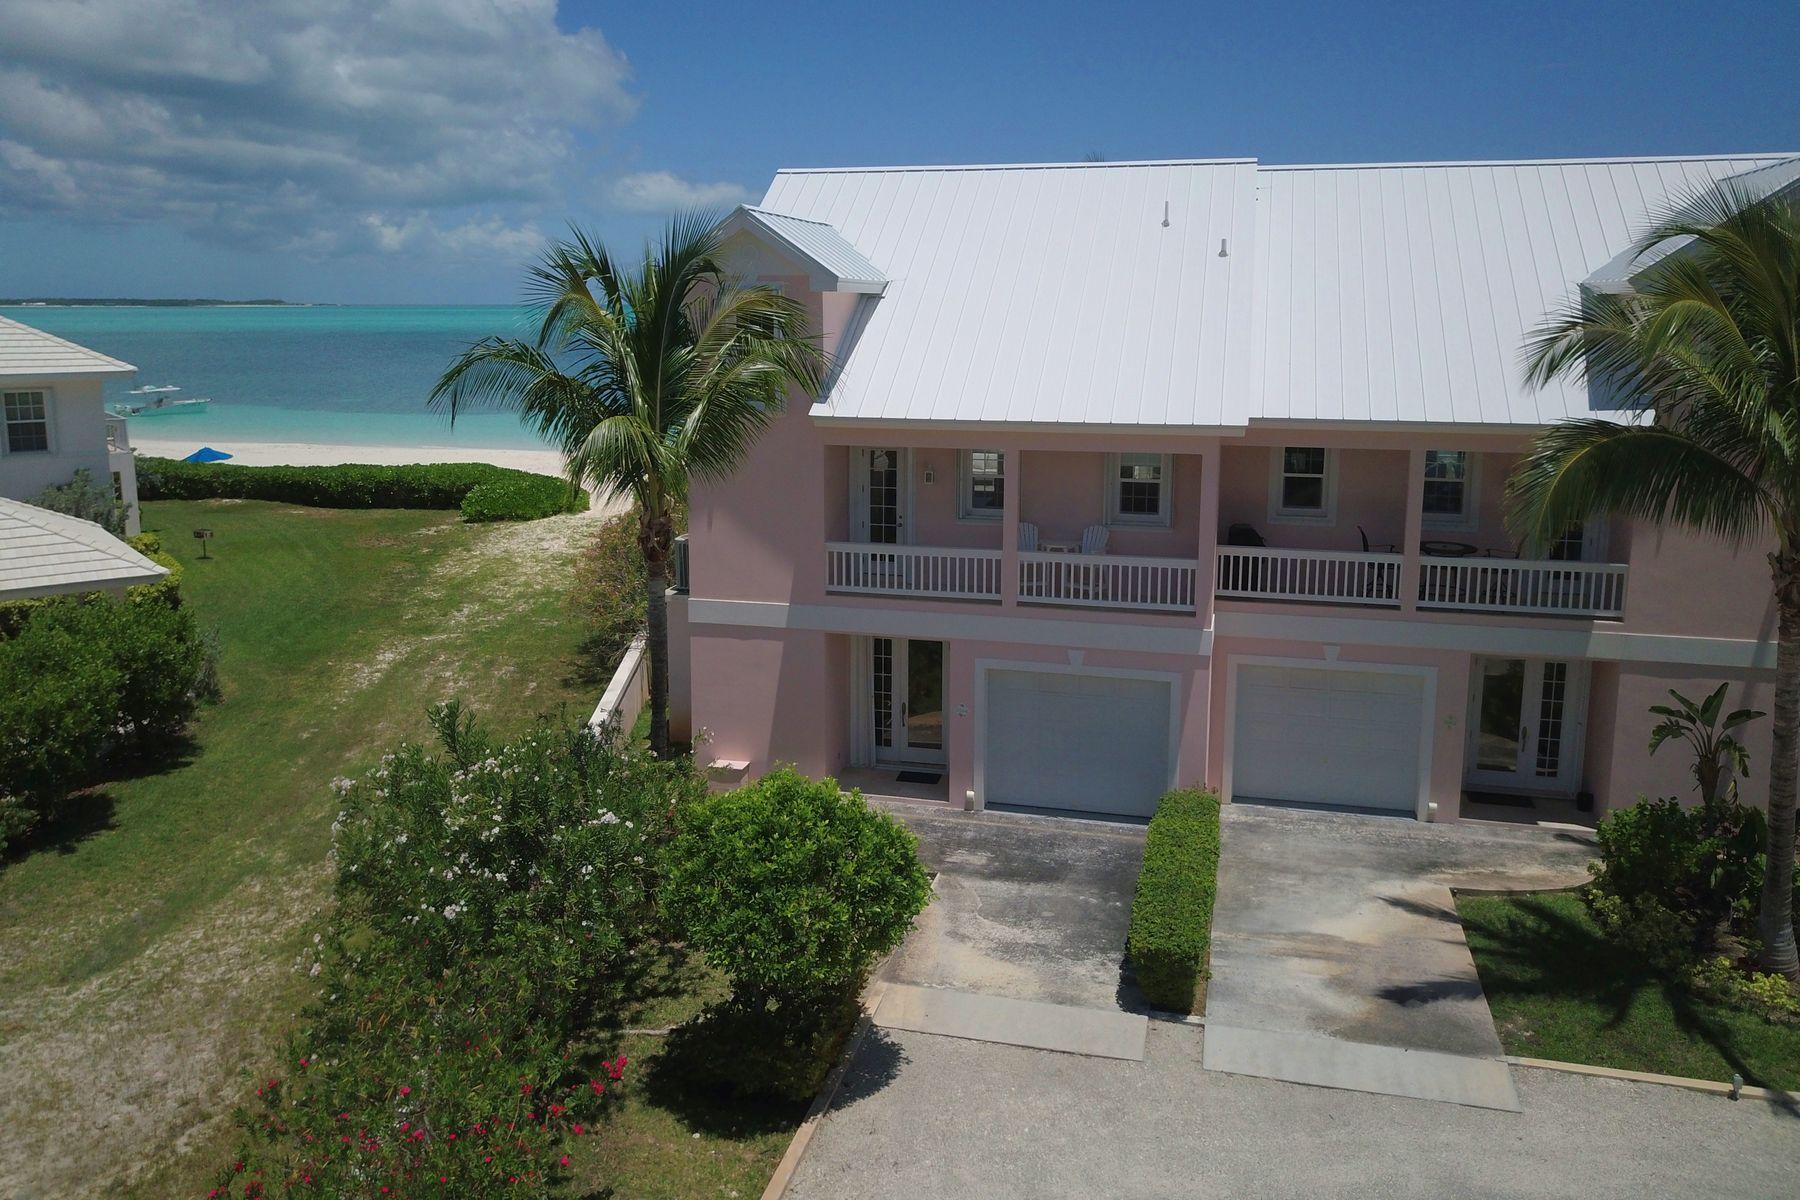 Kat Mülkiyeti için Satış at Royal Poinciana 2504 Treasure Cay, Abaco, Bahamalar